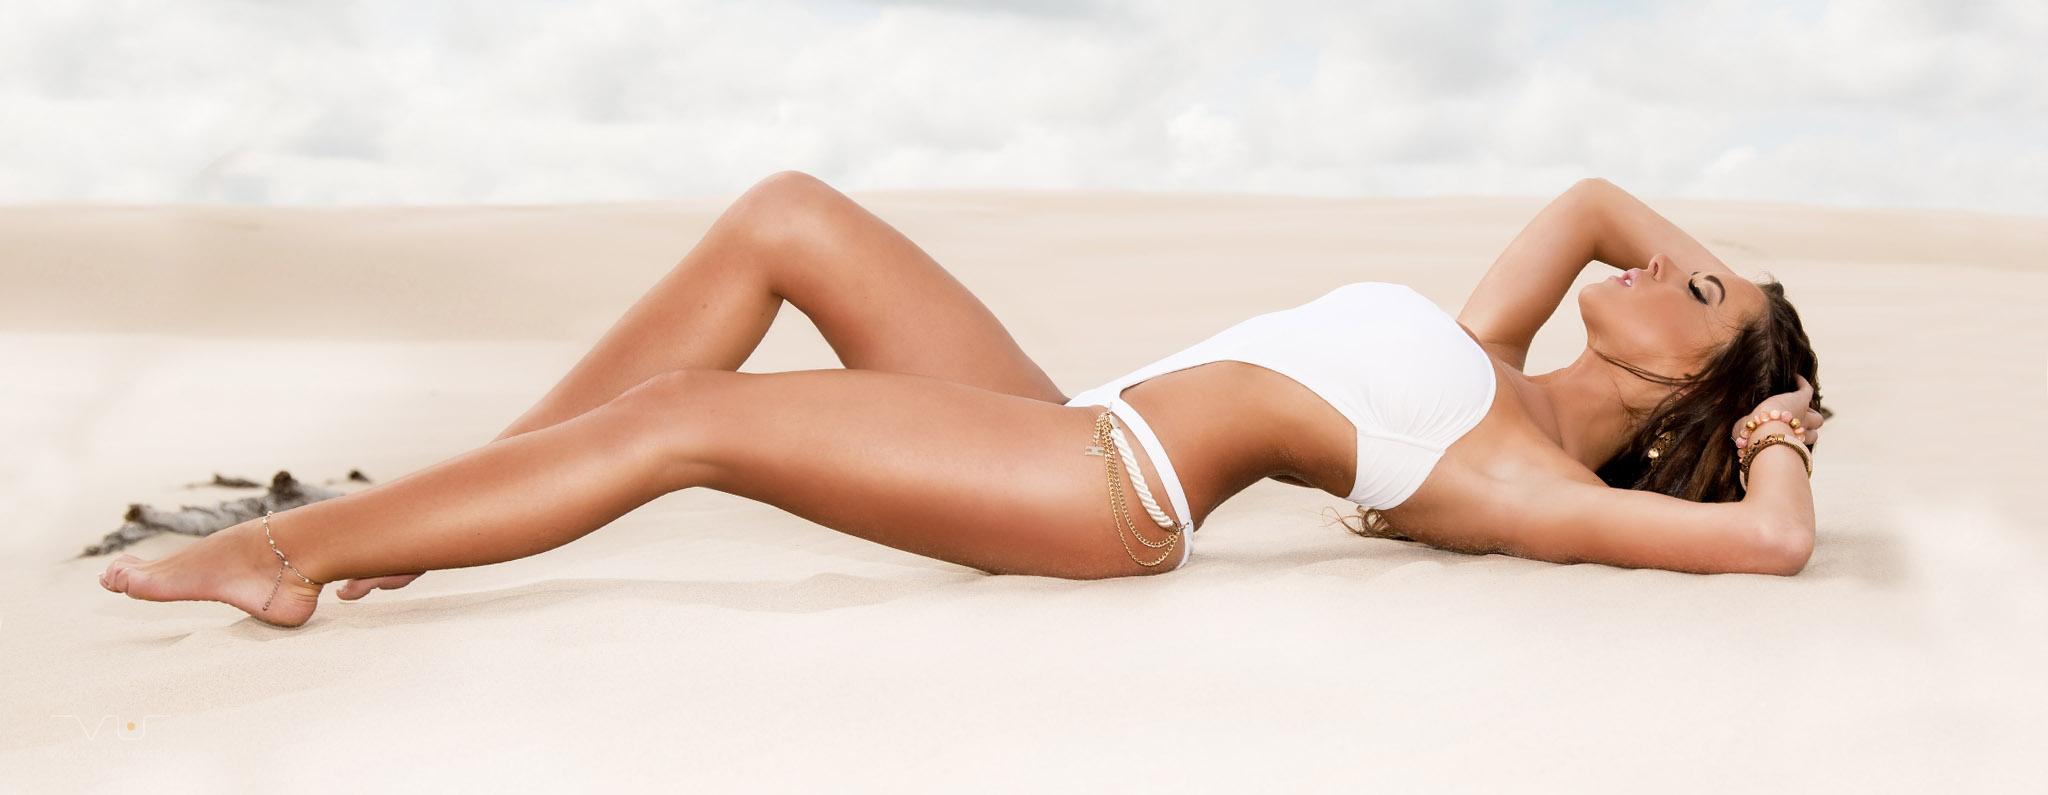 Bilder VU Header Photography 03 Bademode - Beachwear